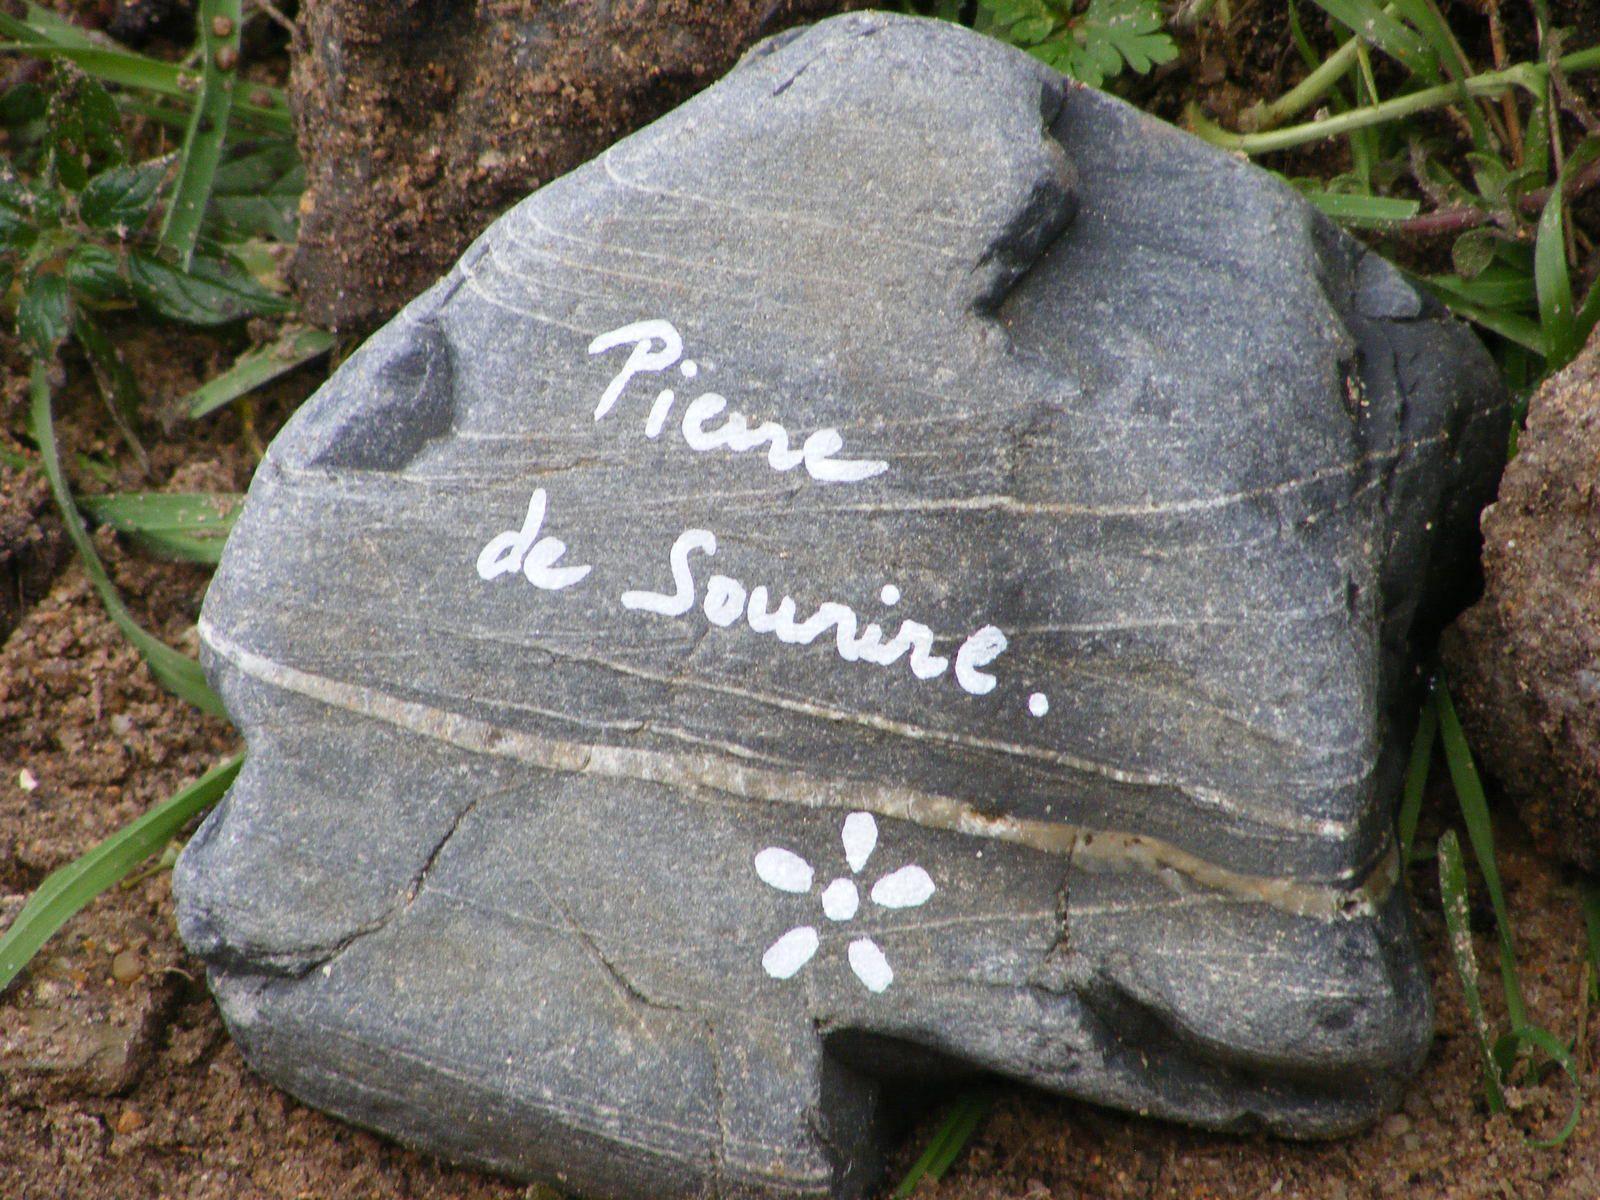 La Petite Roseraie du Cap Lihou